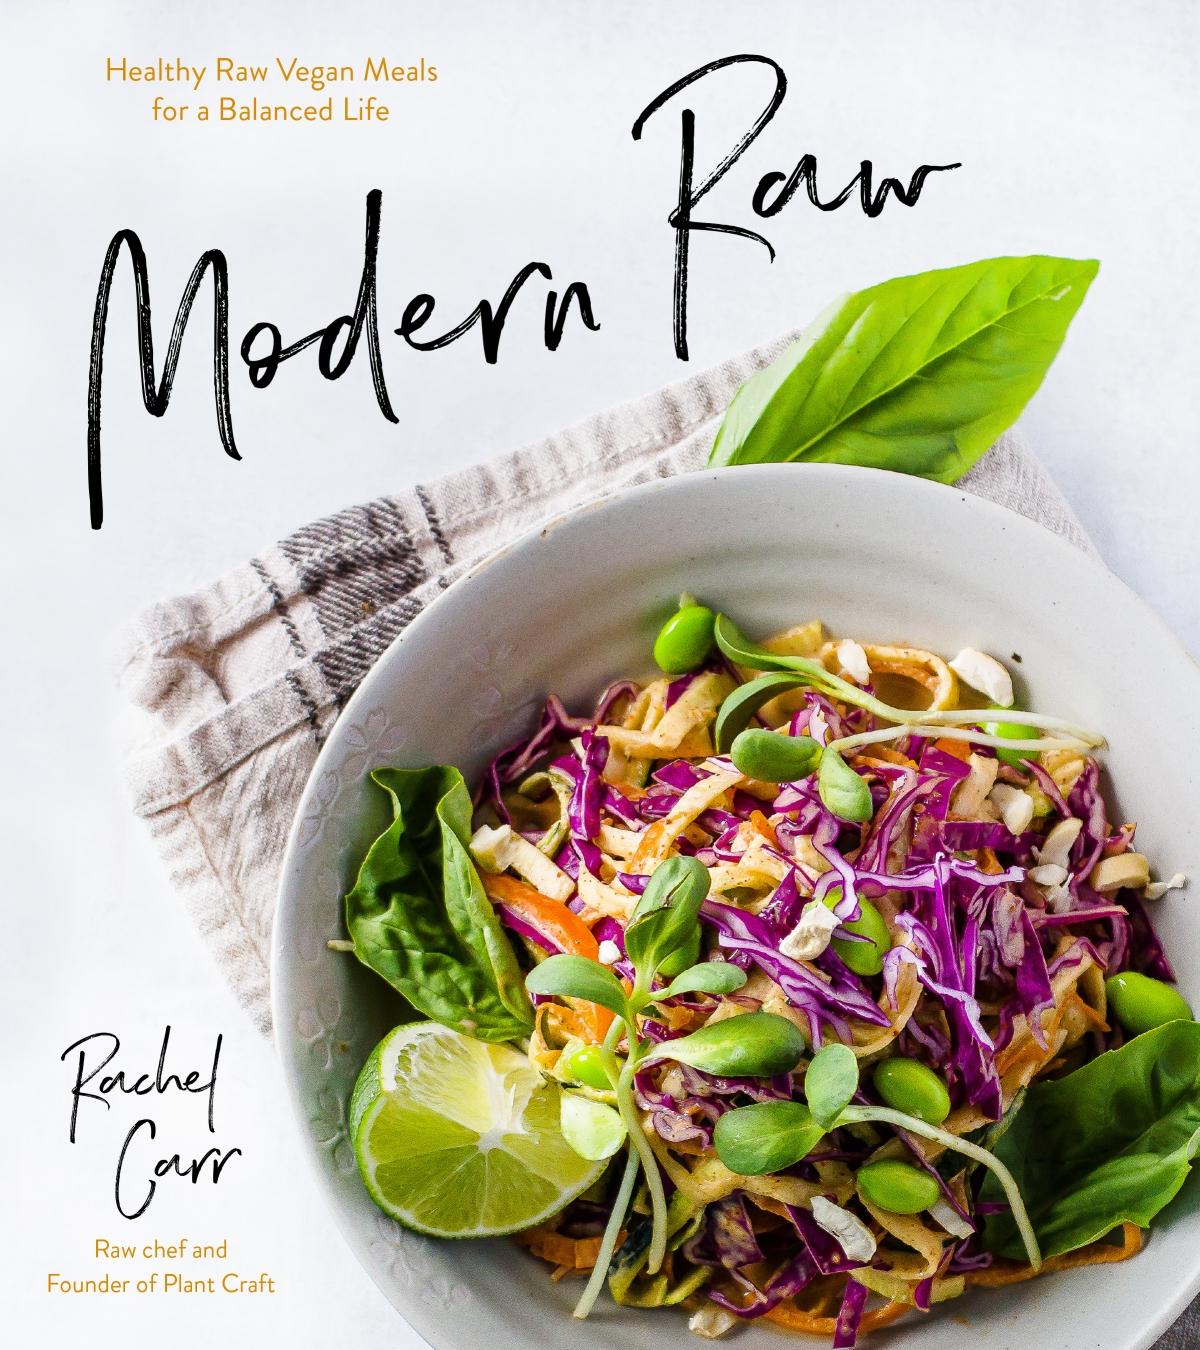 Modern Raw cover.jpg